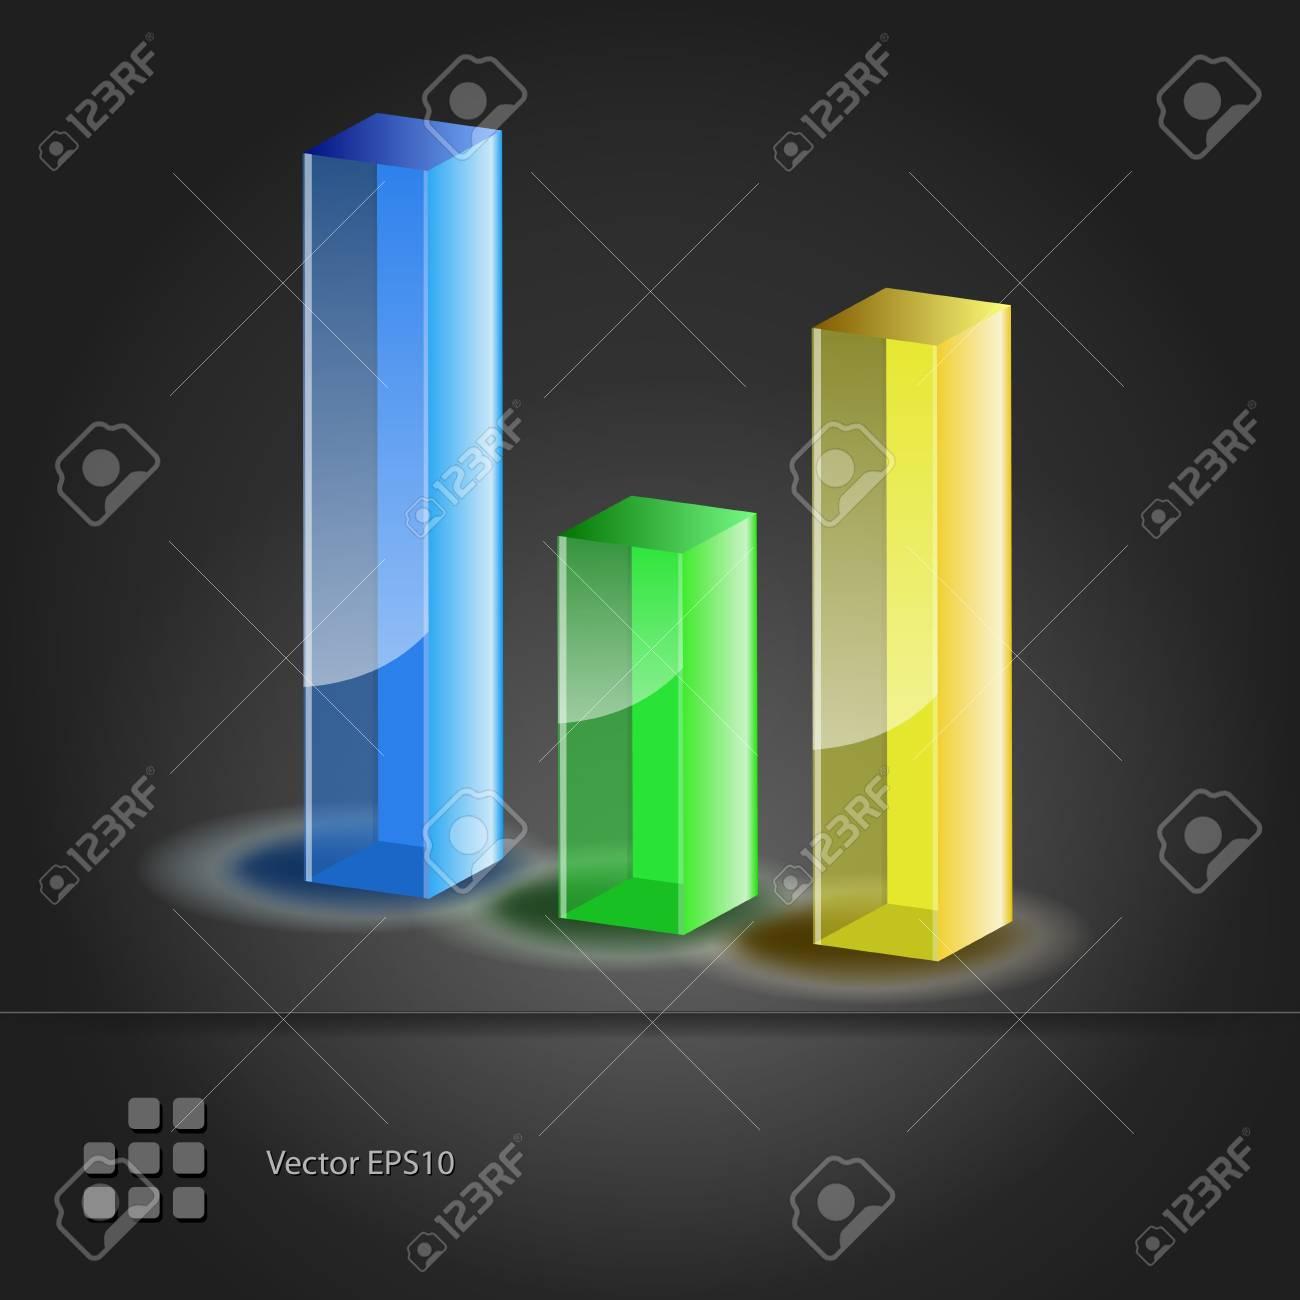 Crystal glass diagram  Bar Chart icon  Vector illustration Stock Vector - 15395634